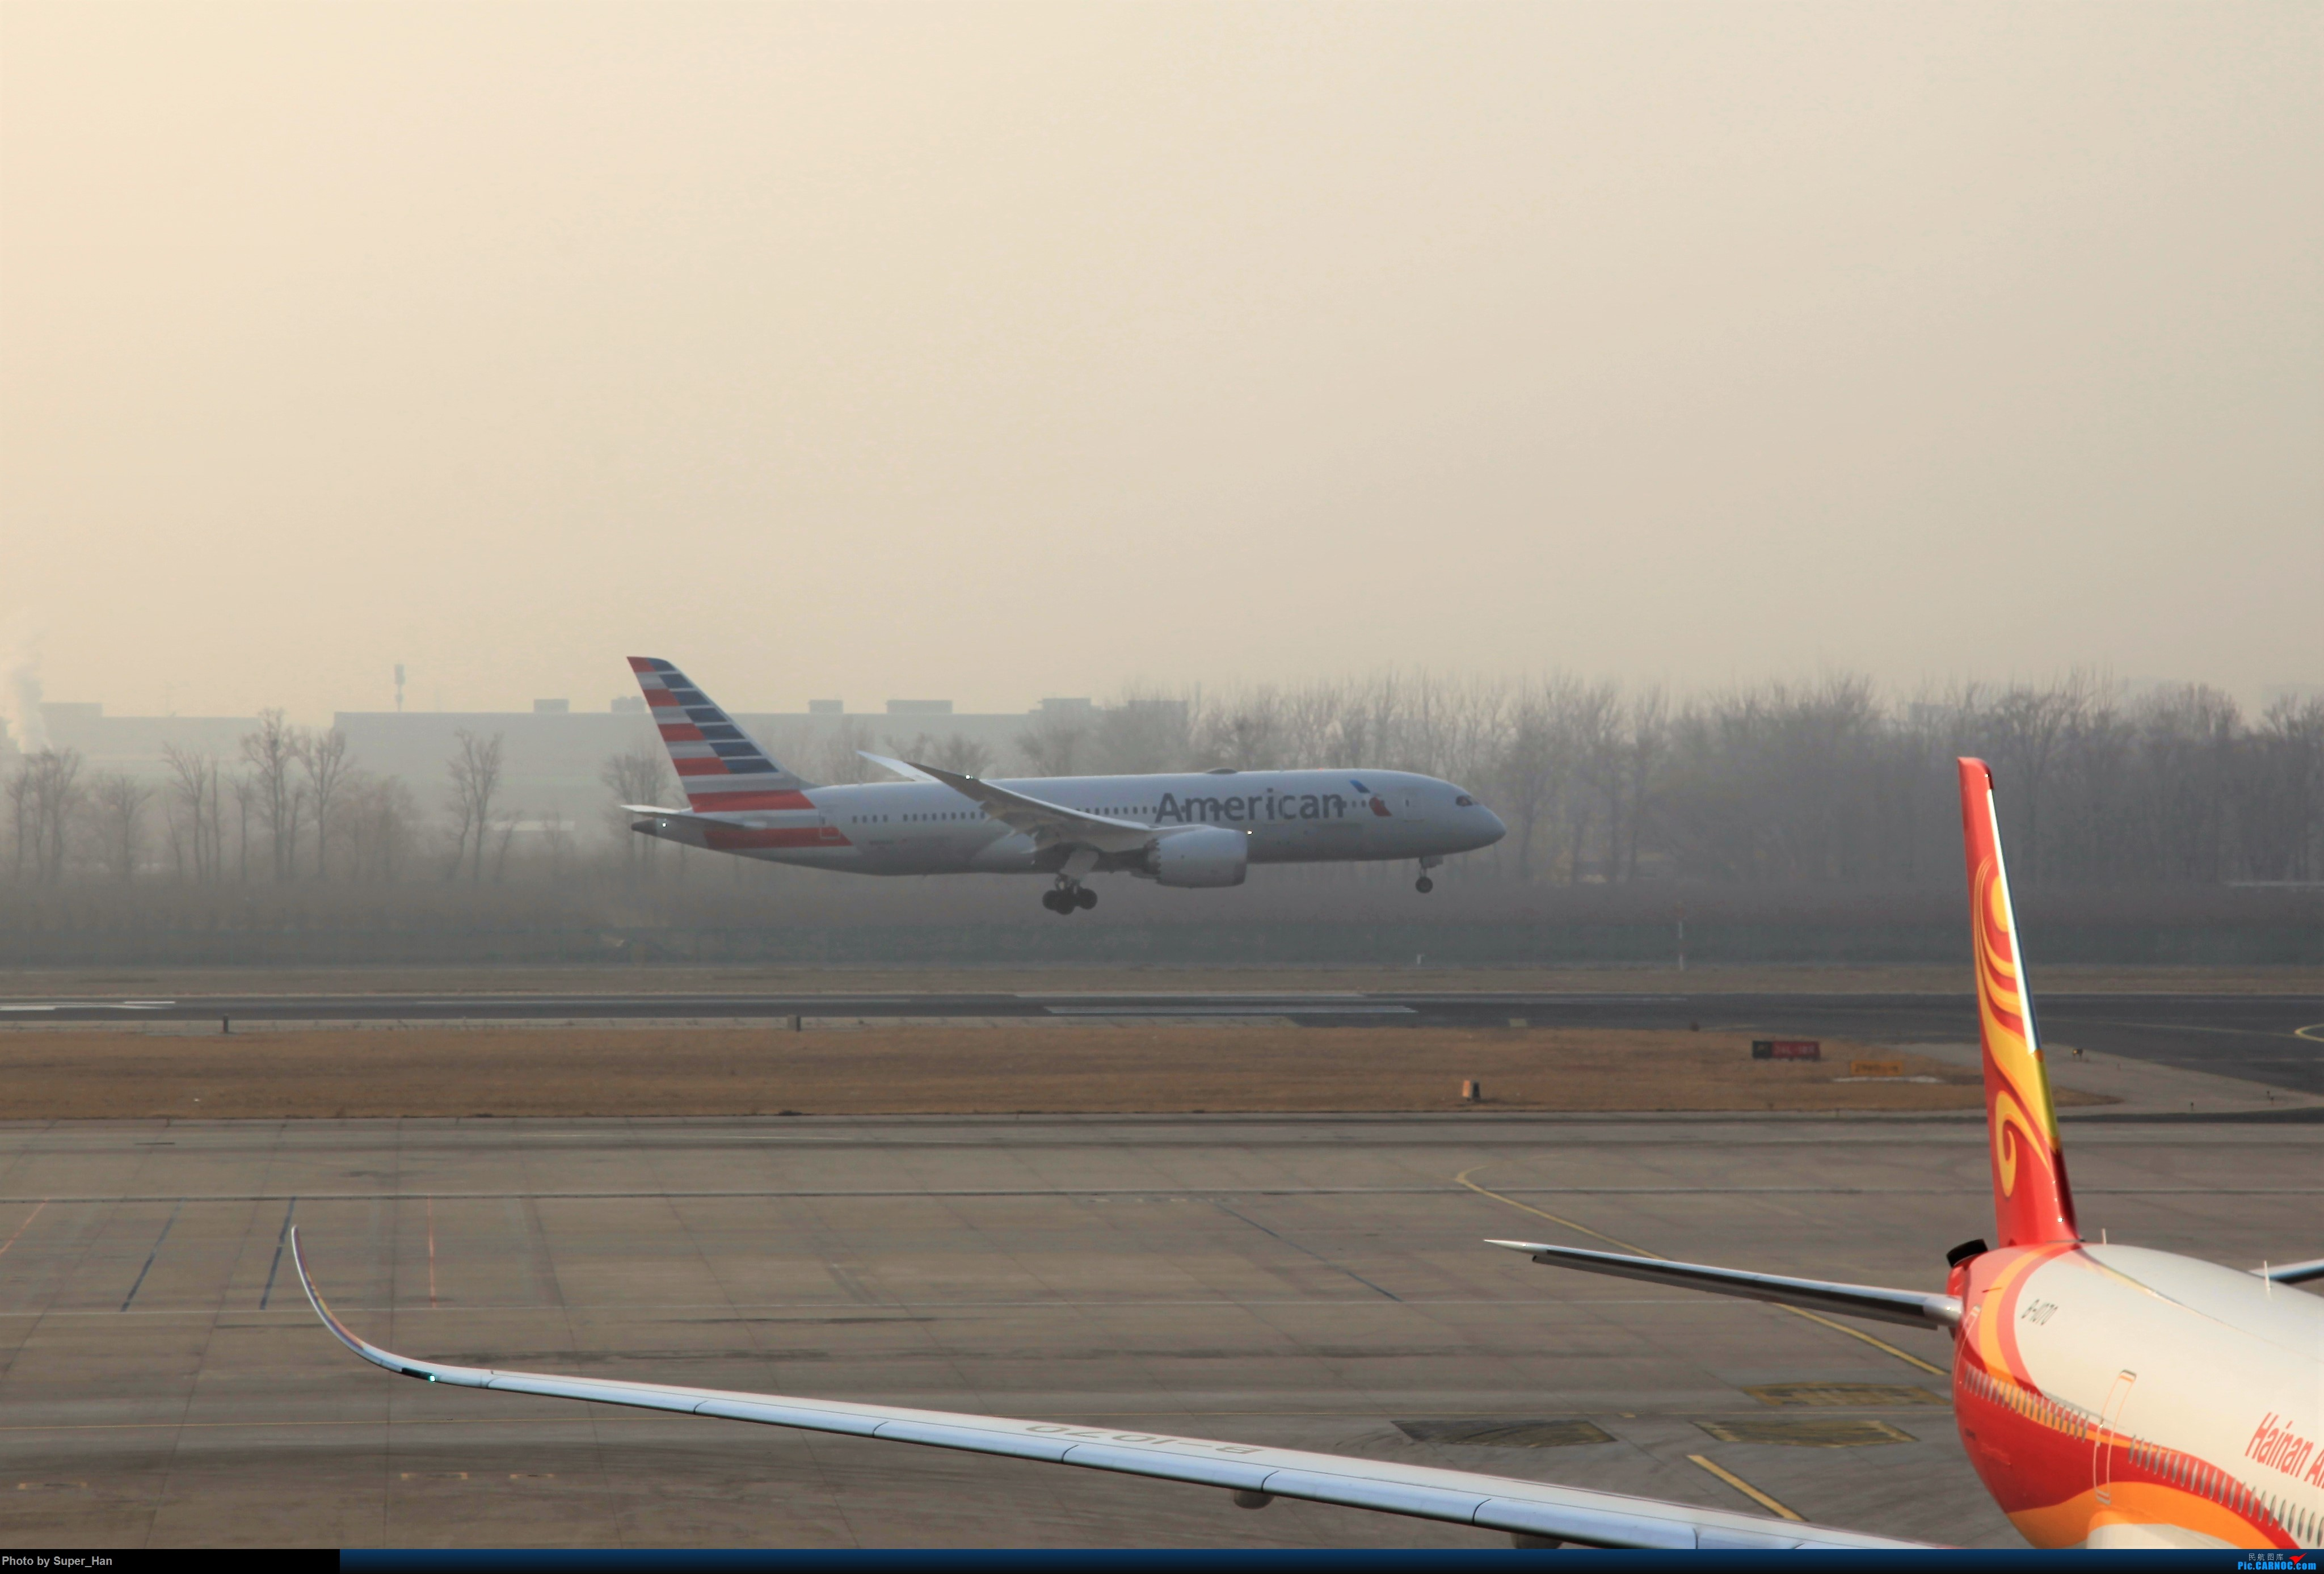 Re:[原创]2019虹桥出发飞北京第一拍 BOEING 787-8  中国北京首都国际机场